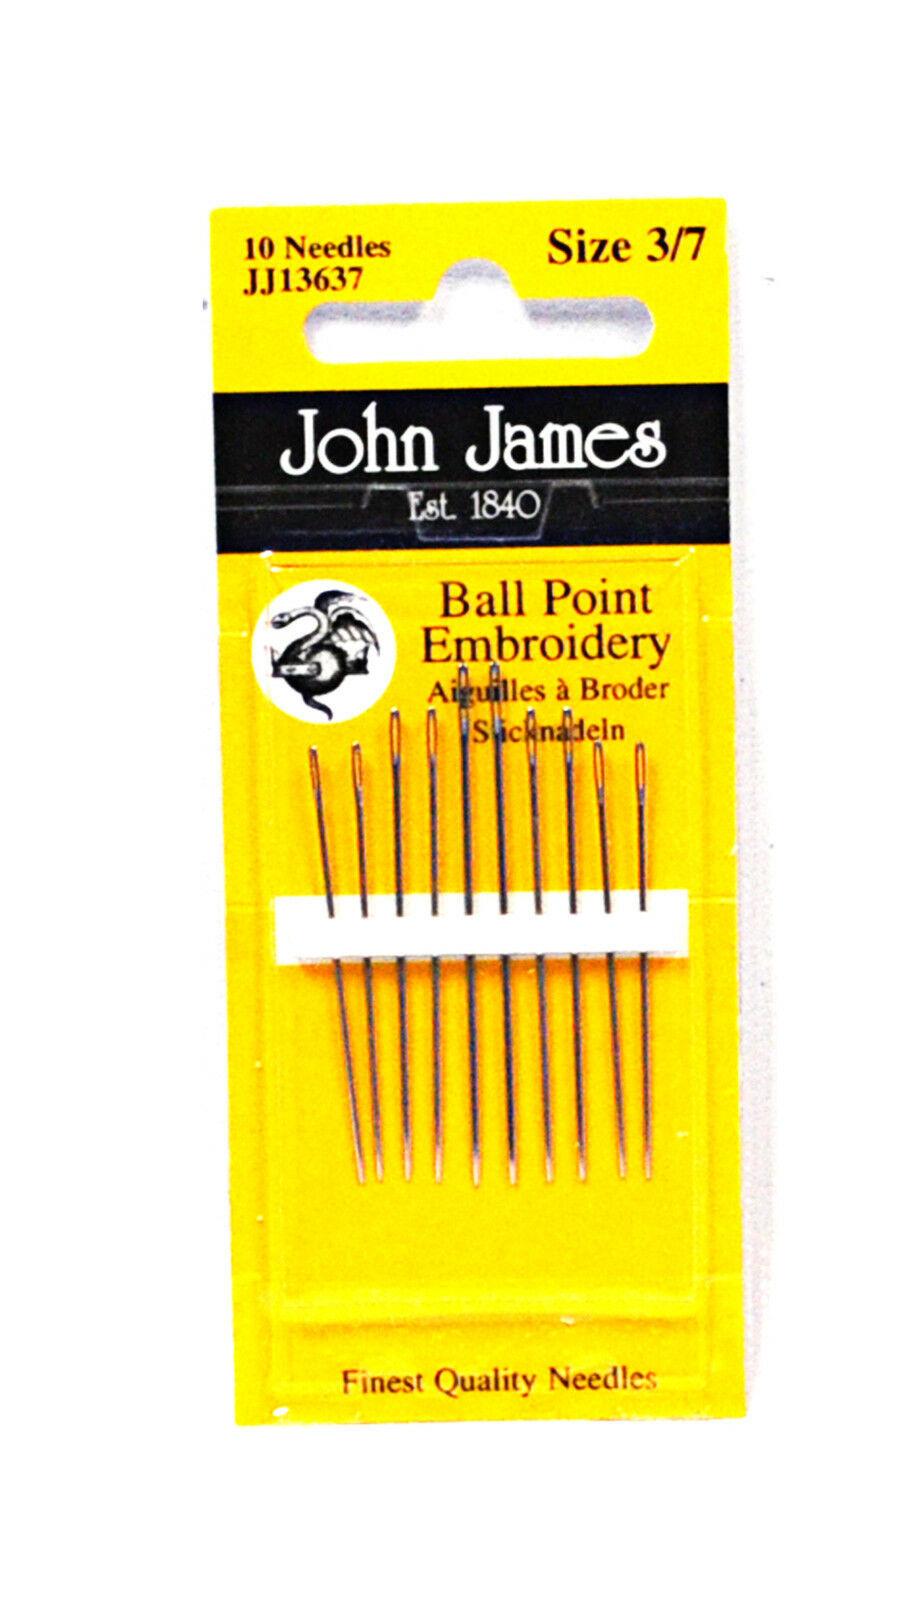 John James Stickerei Kugelspitze Nadeln Verschiedene Größen 3/7